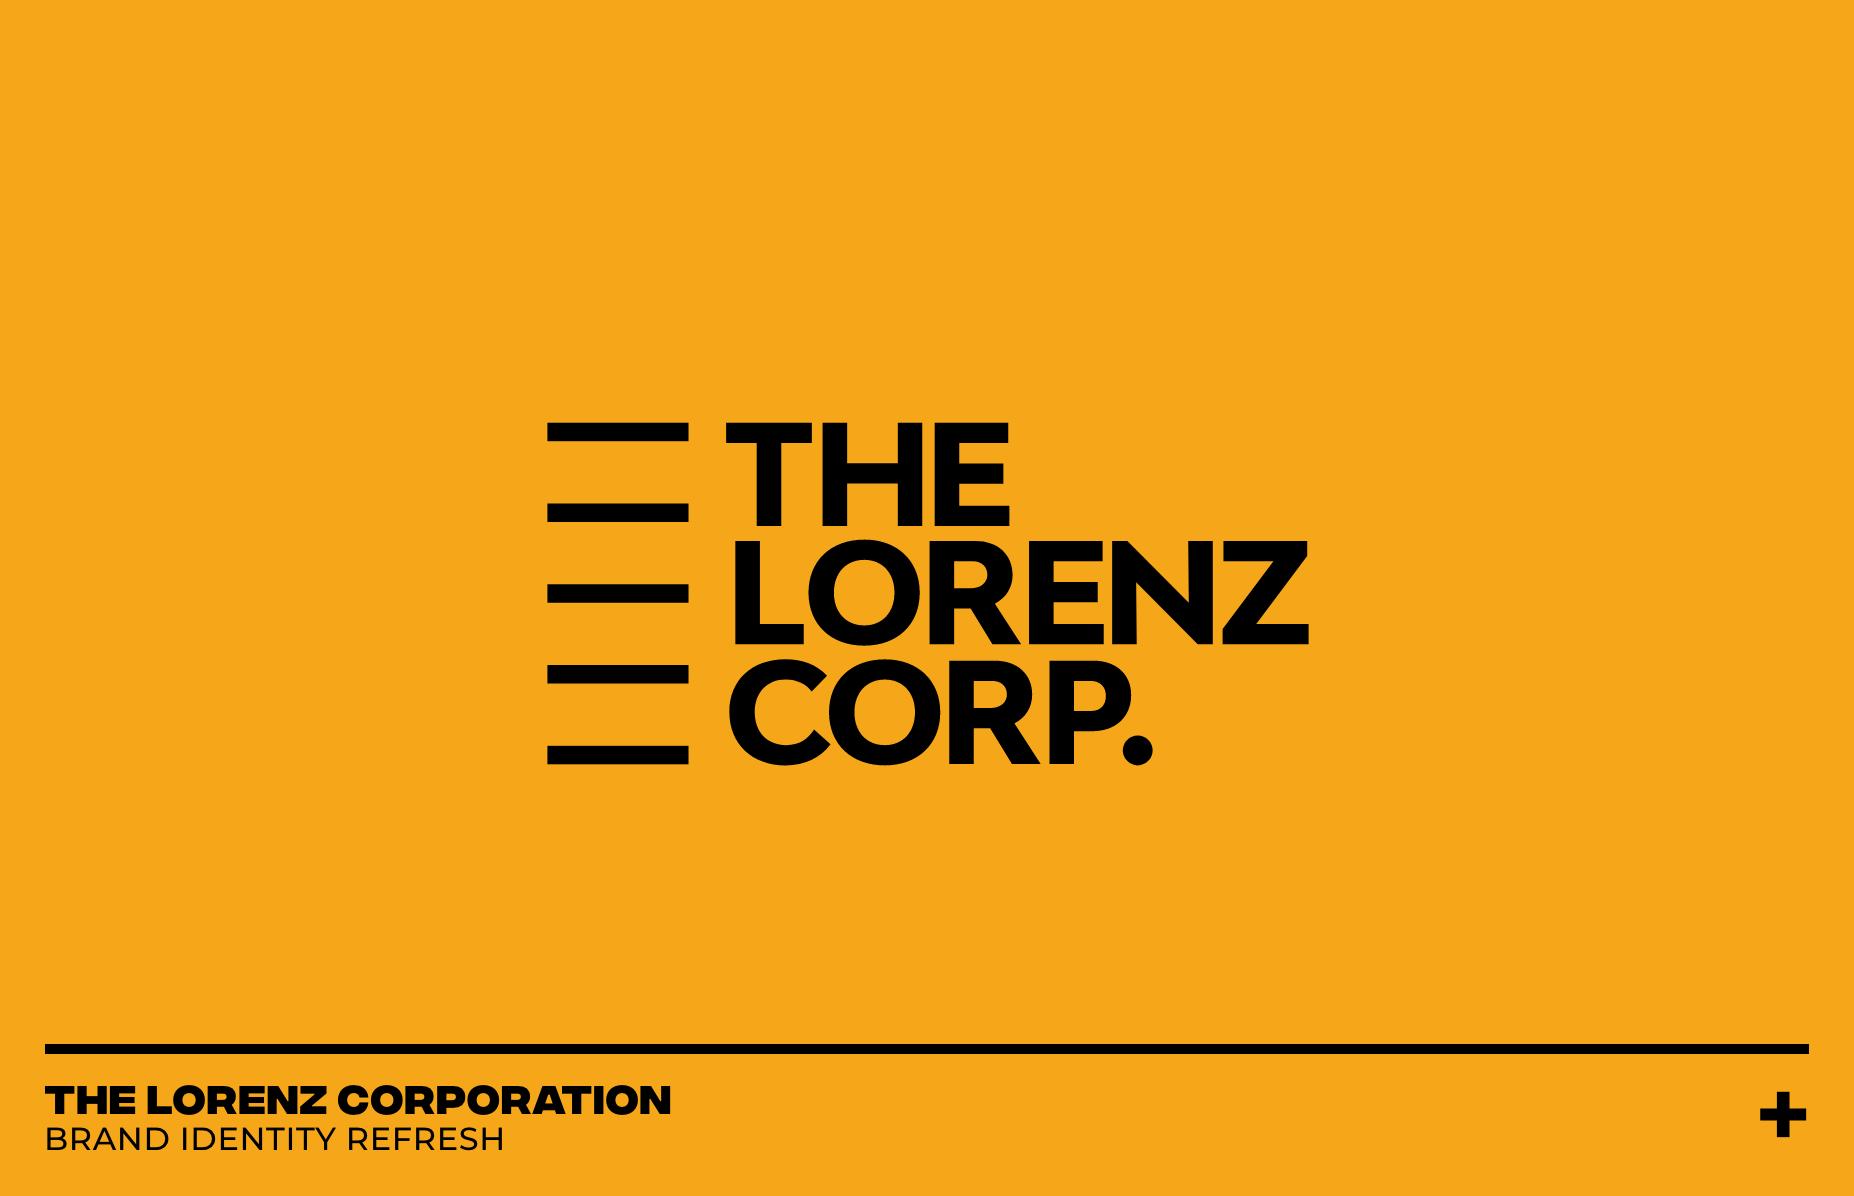 Lorenz Corp